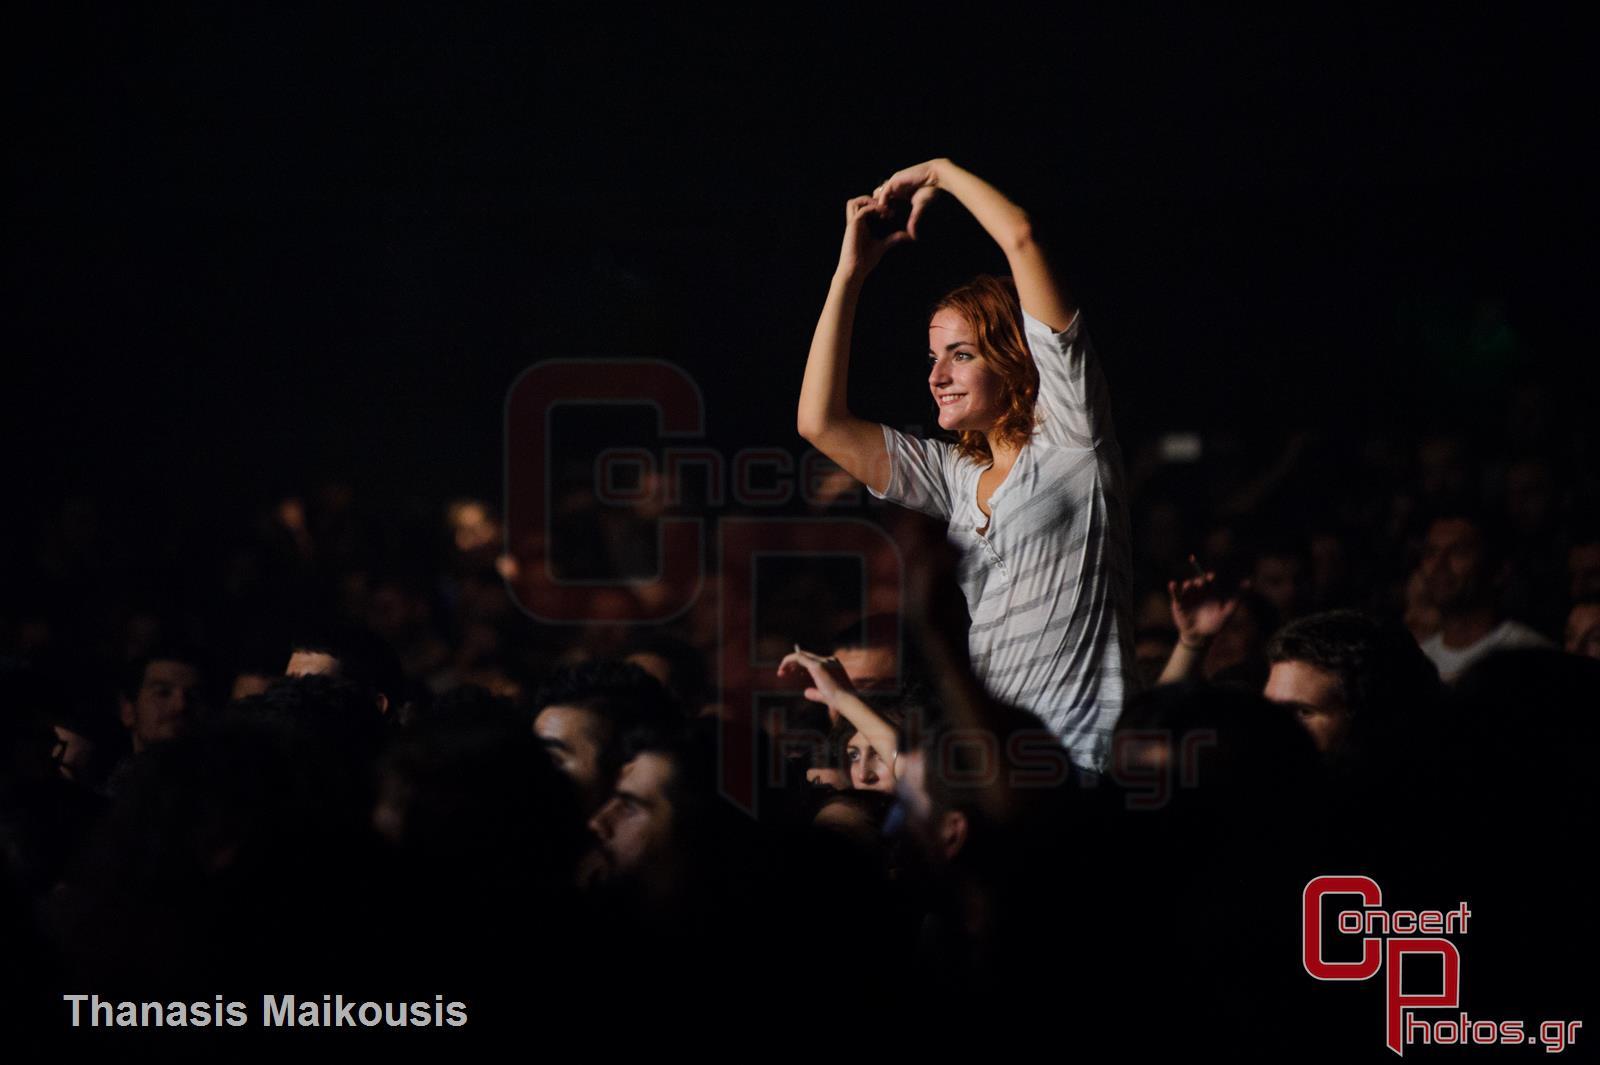 Gramatik-Gramatik Votanikos 2013 photographer: Thanasis Maikousis - ConcertPhotos-6240